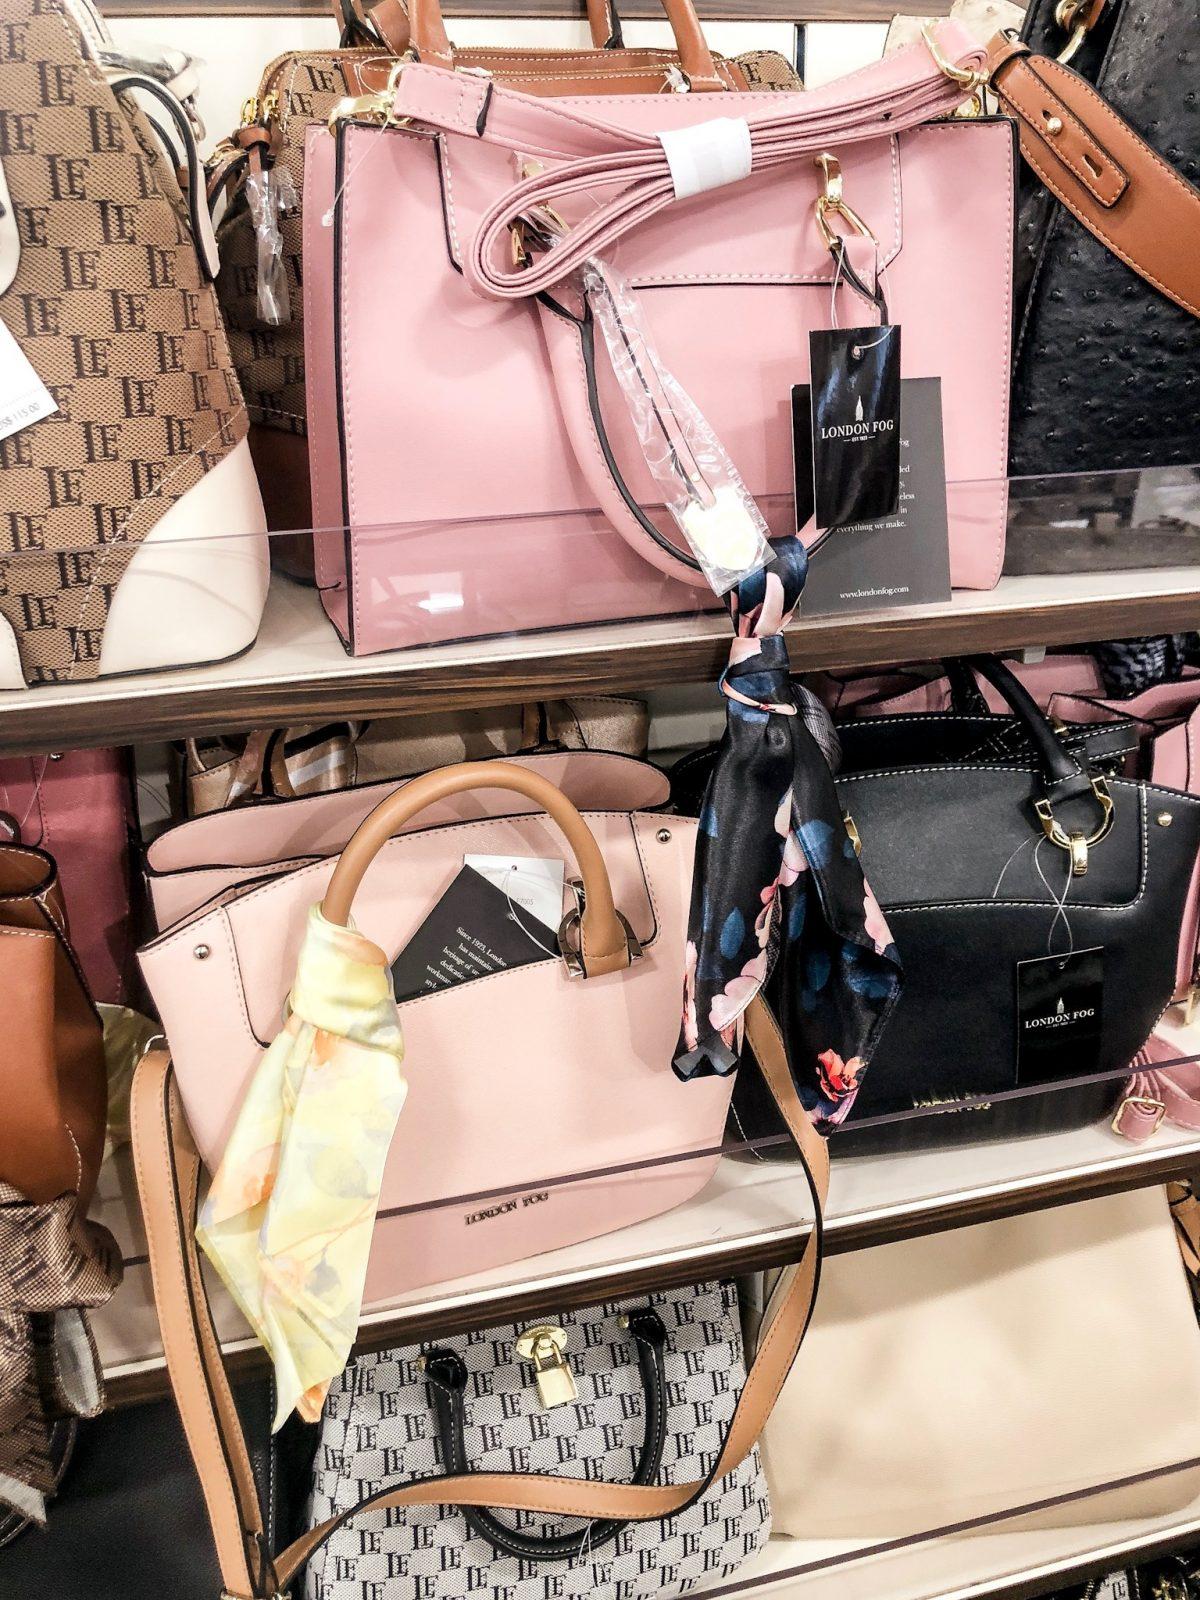 London Fog Handbags in various colors